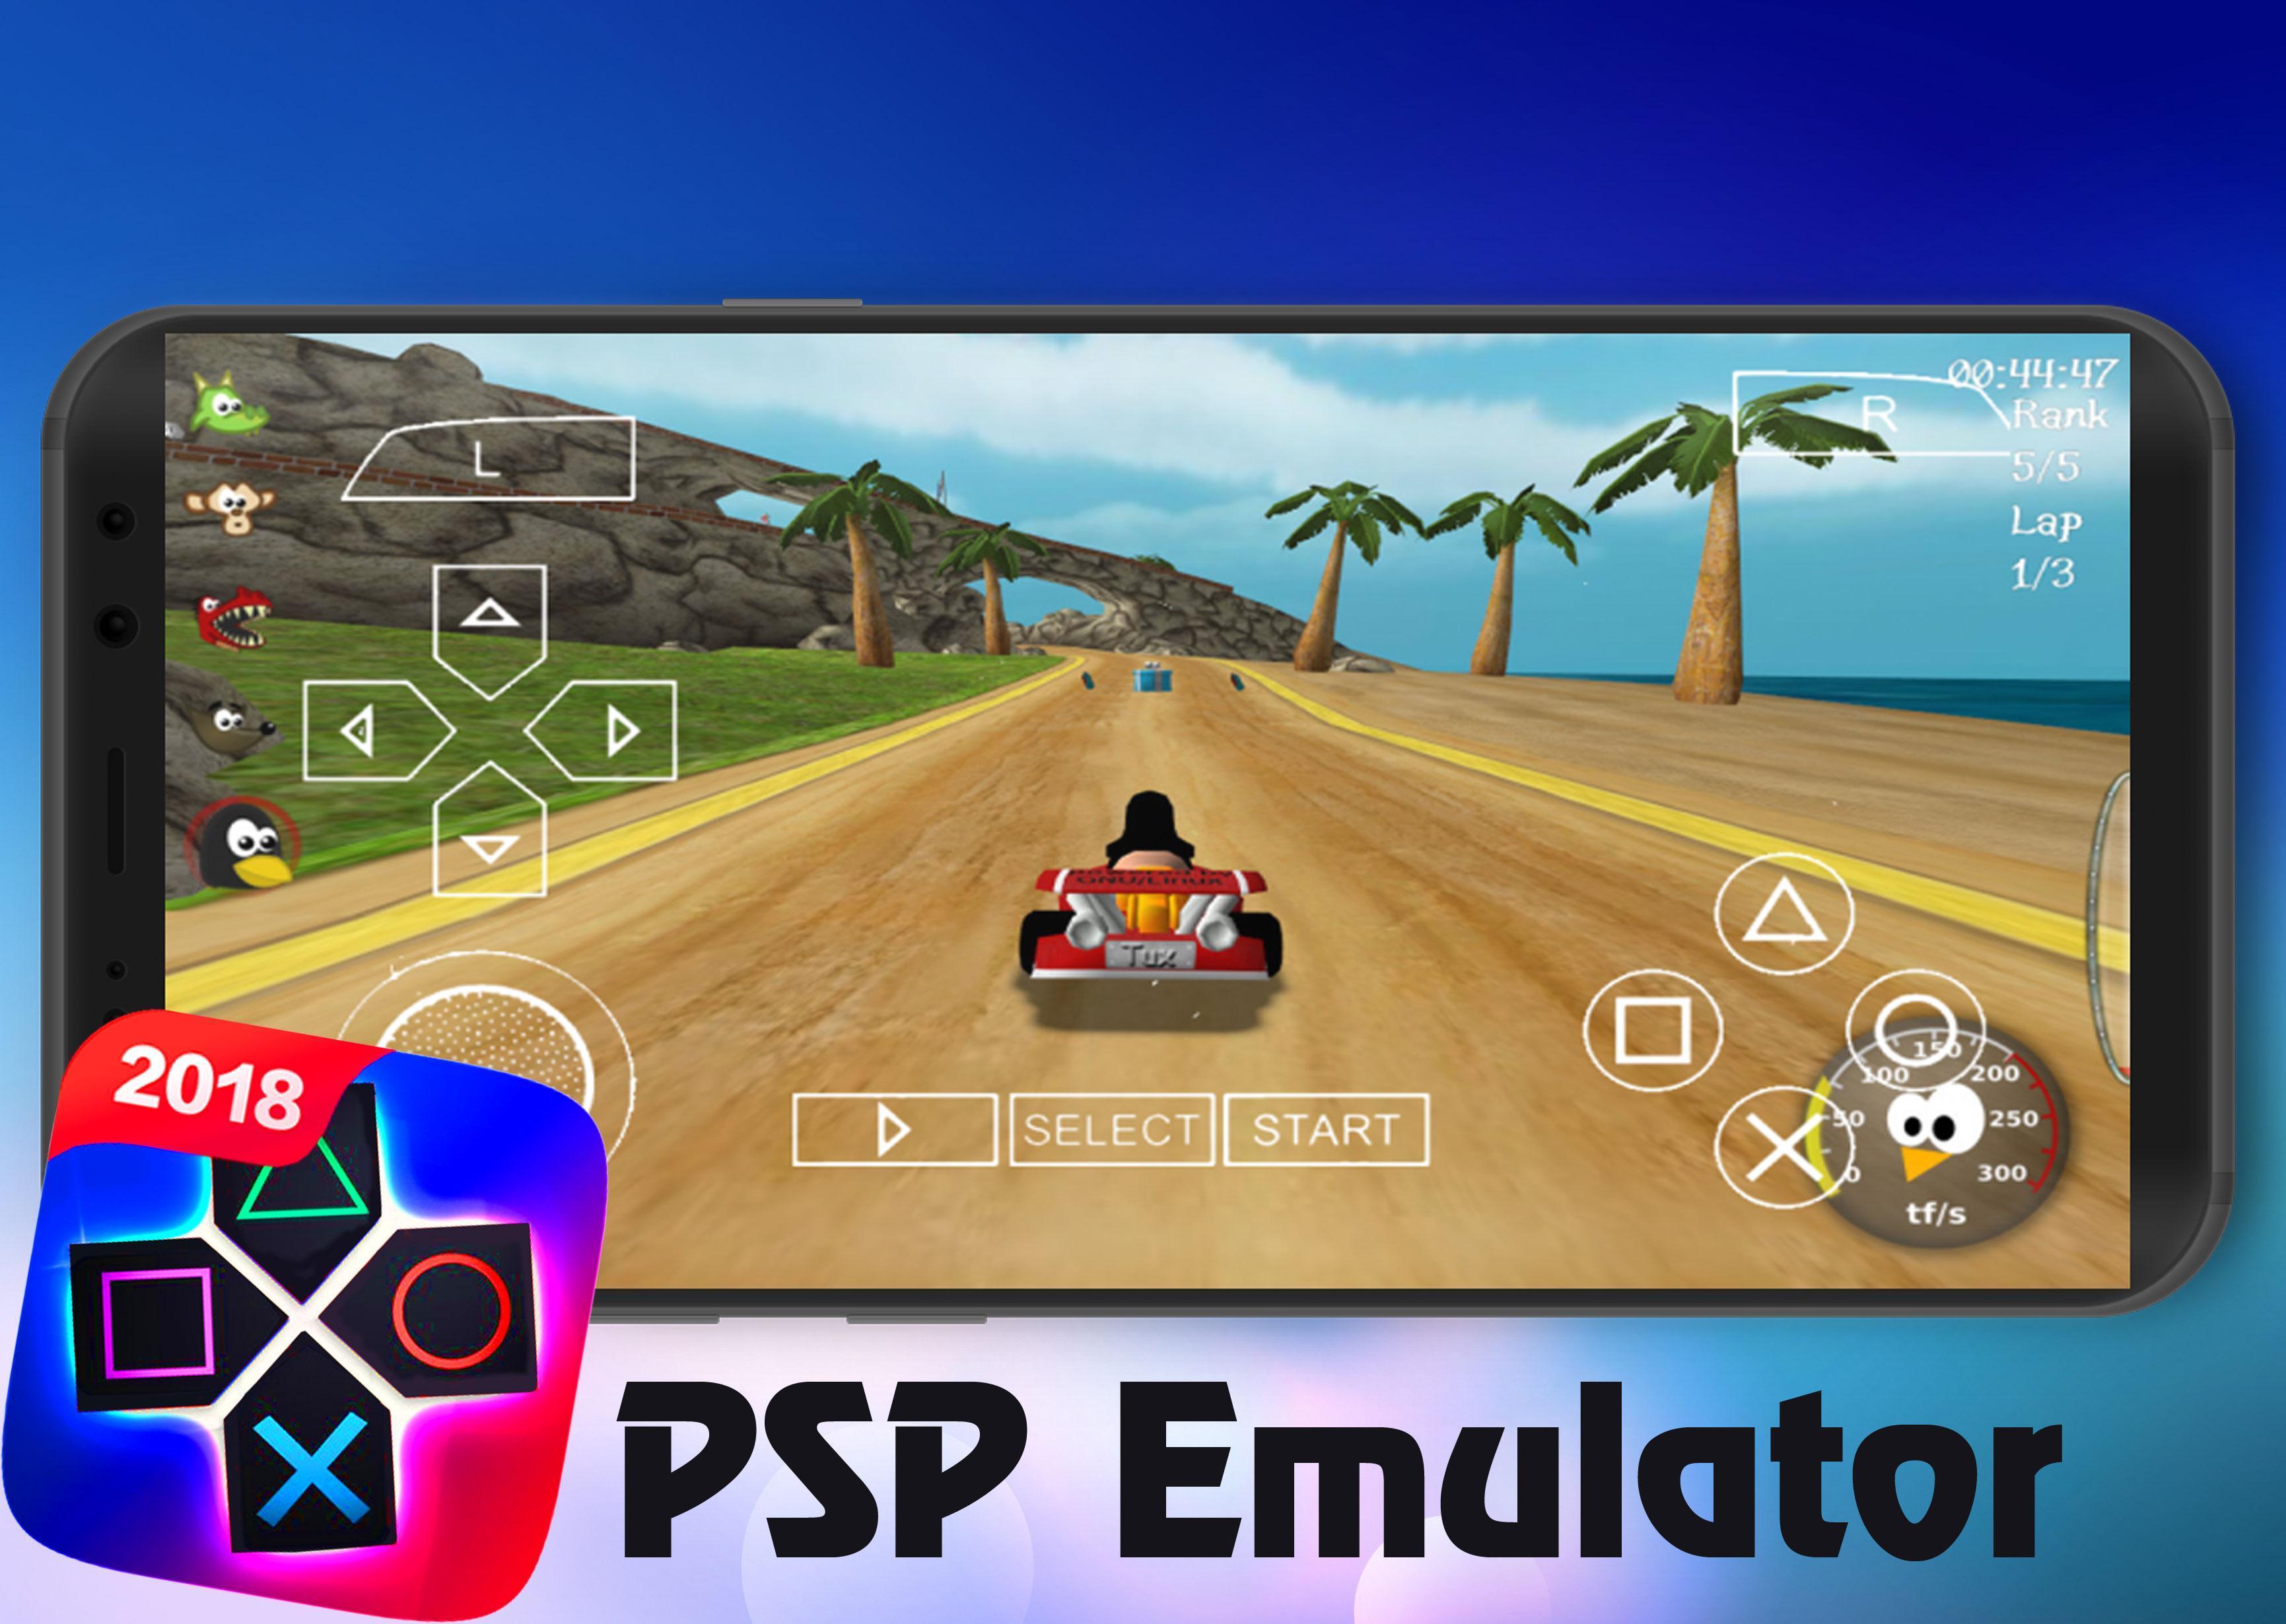 PPSSPP - PSP Emulator Pro 2018 for Android - APK Download